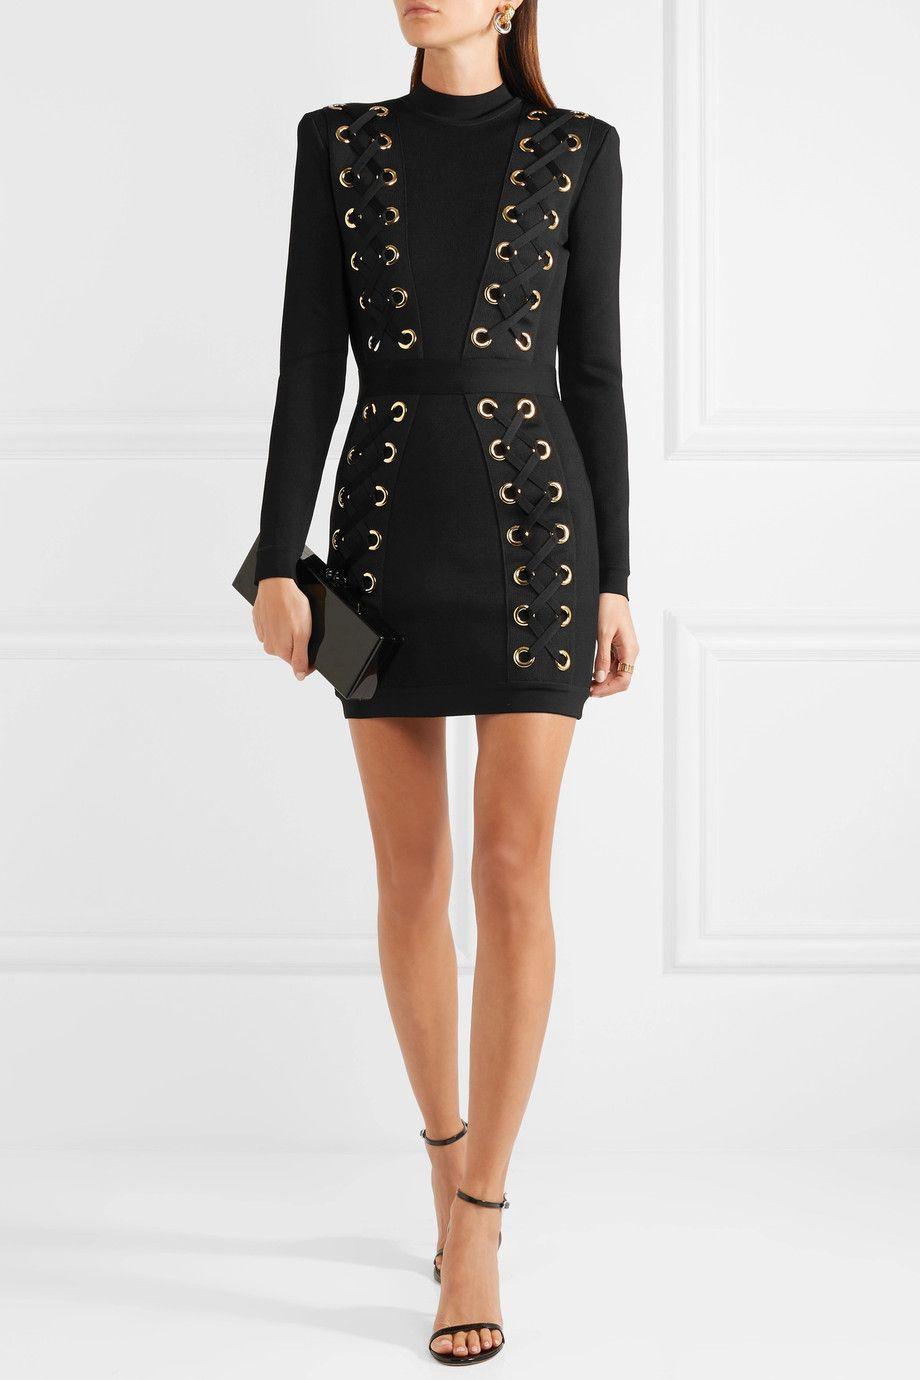 487434d2e7ec BALMAIN Lace-up stretch-jersey mini dress